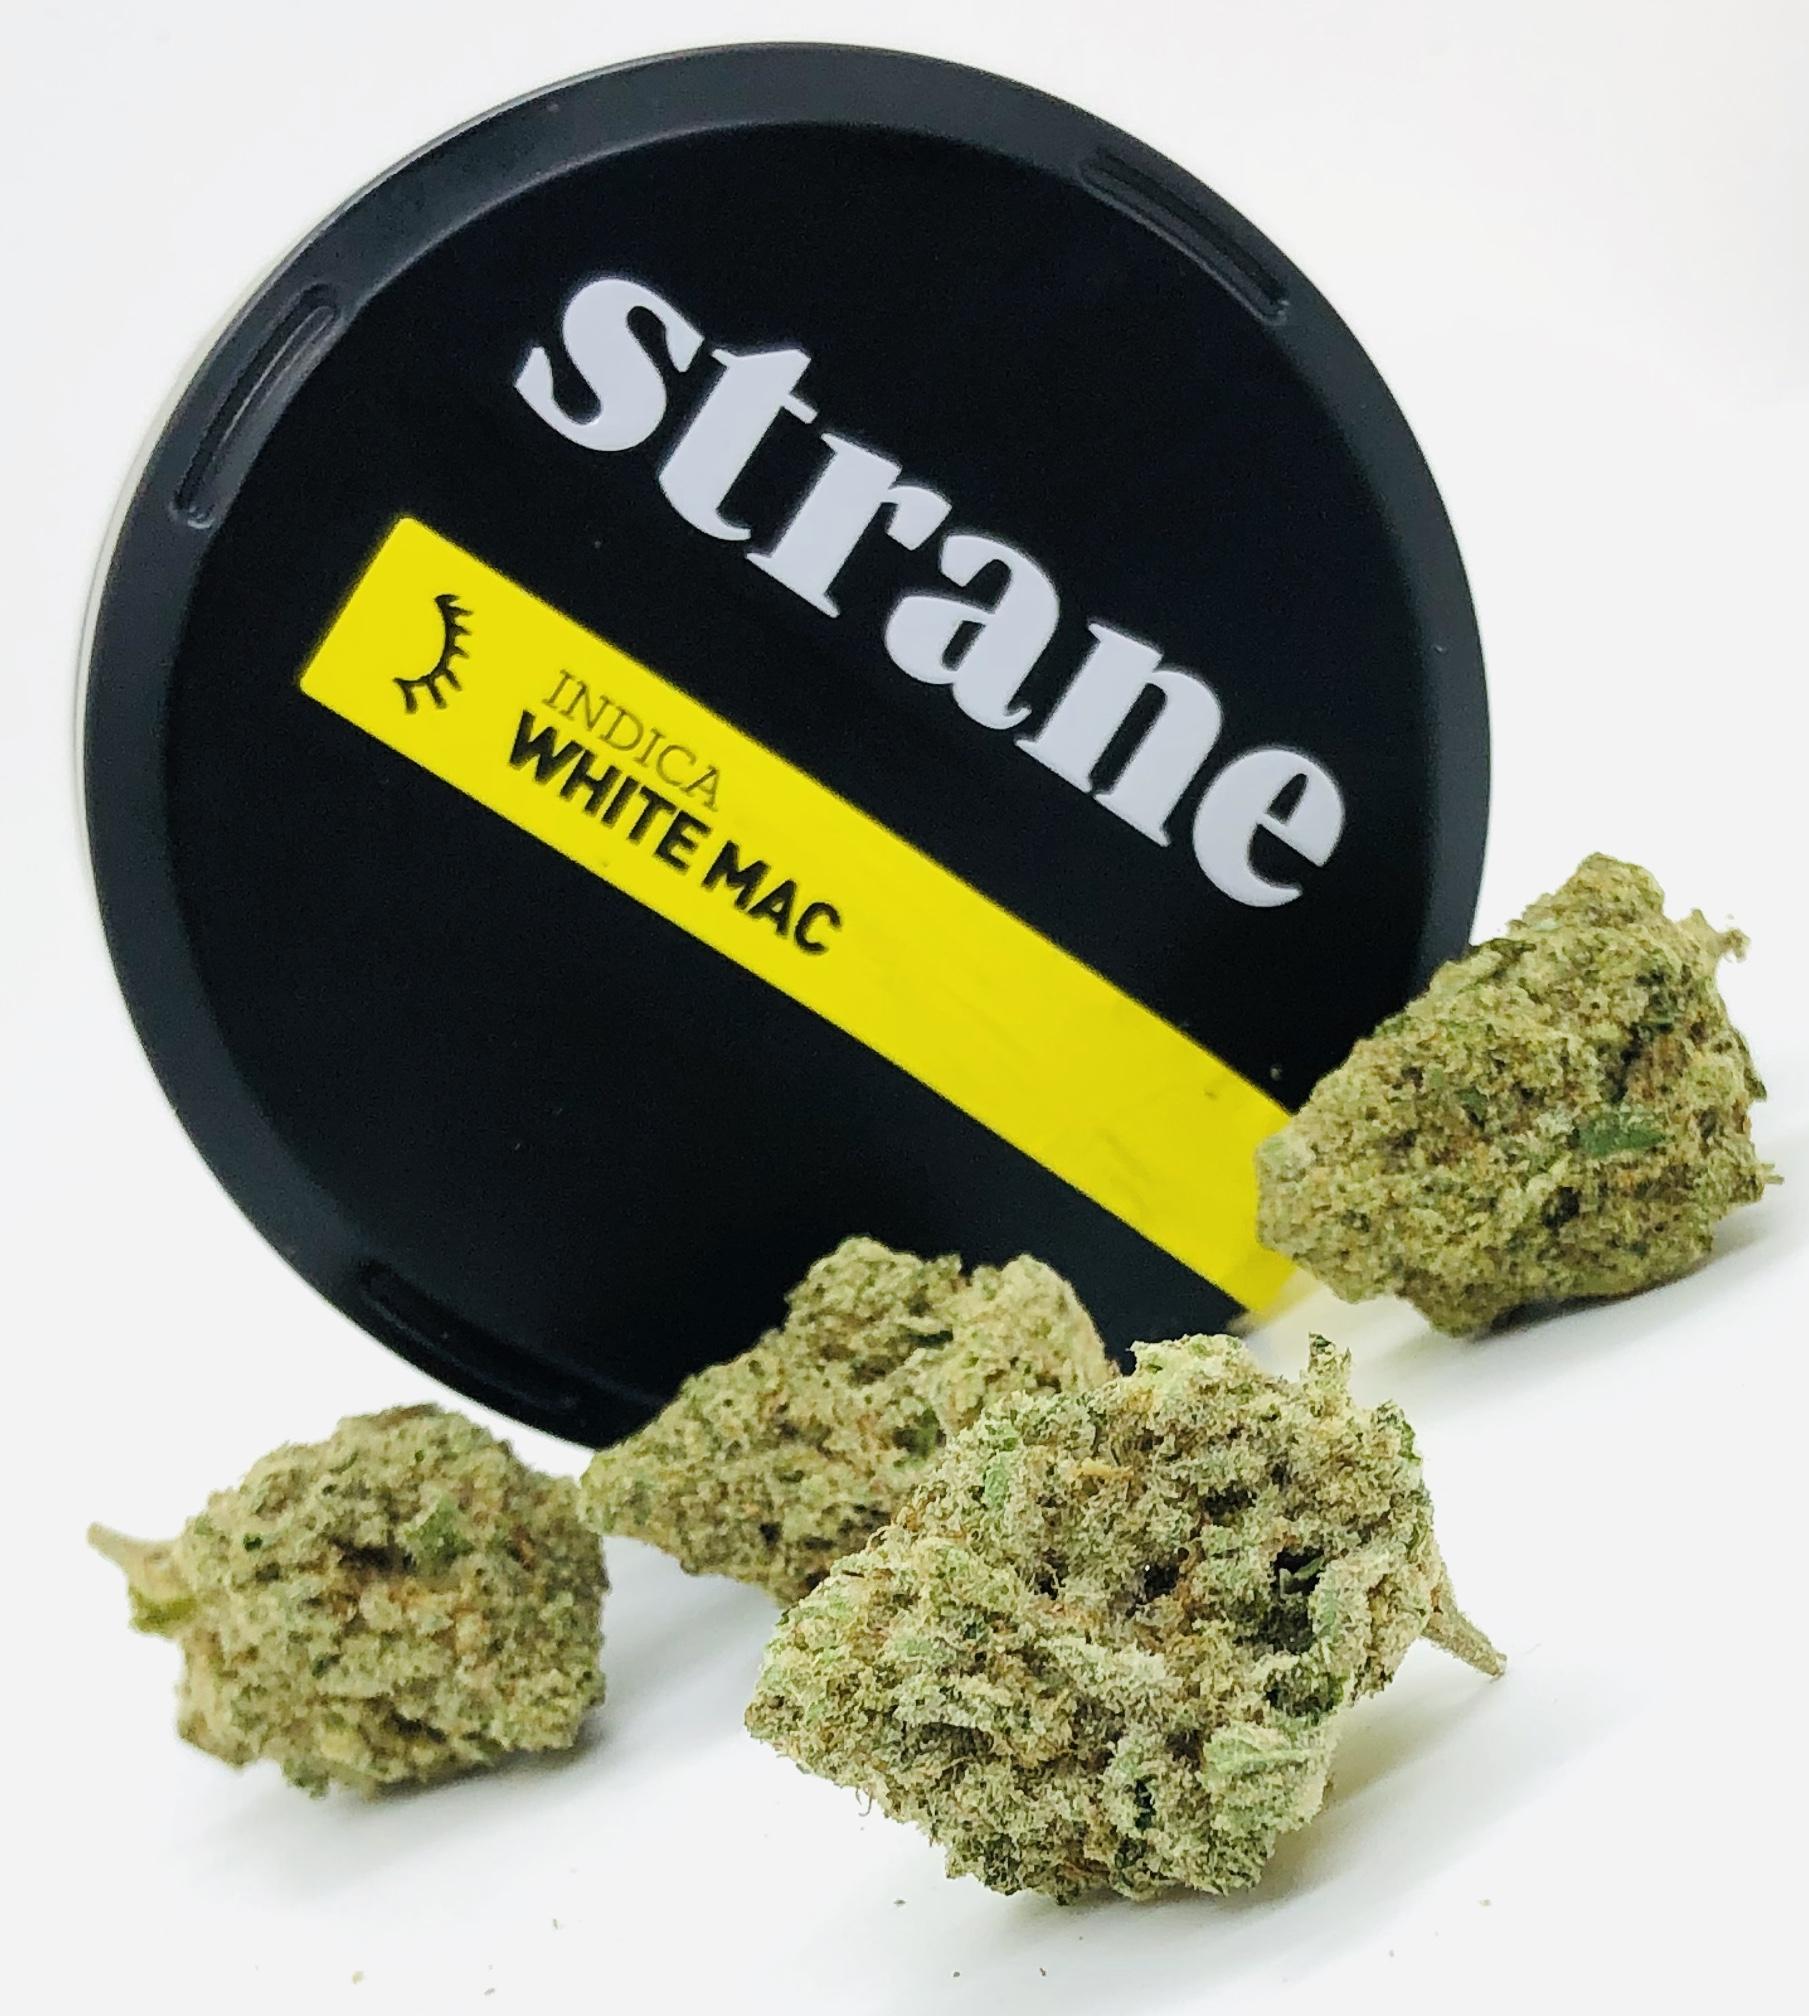 White MAC by Strane - Maryland Cannabis Reviews